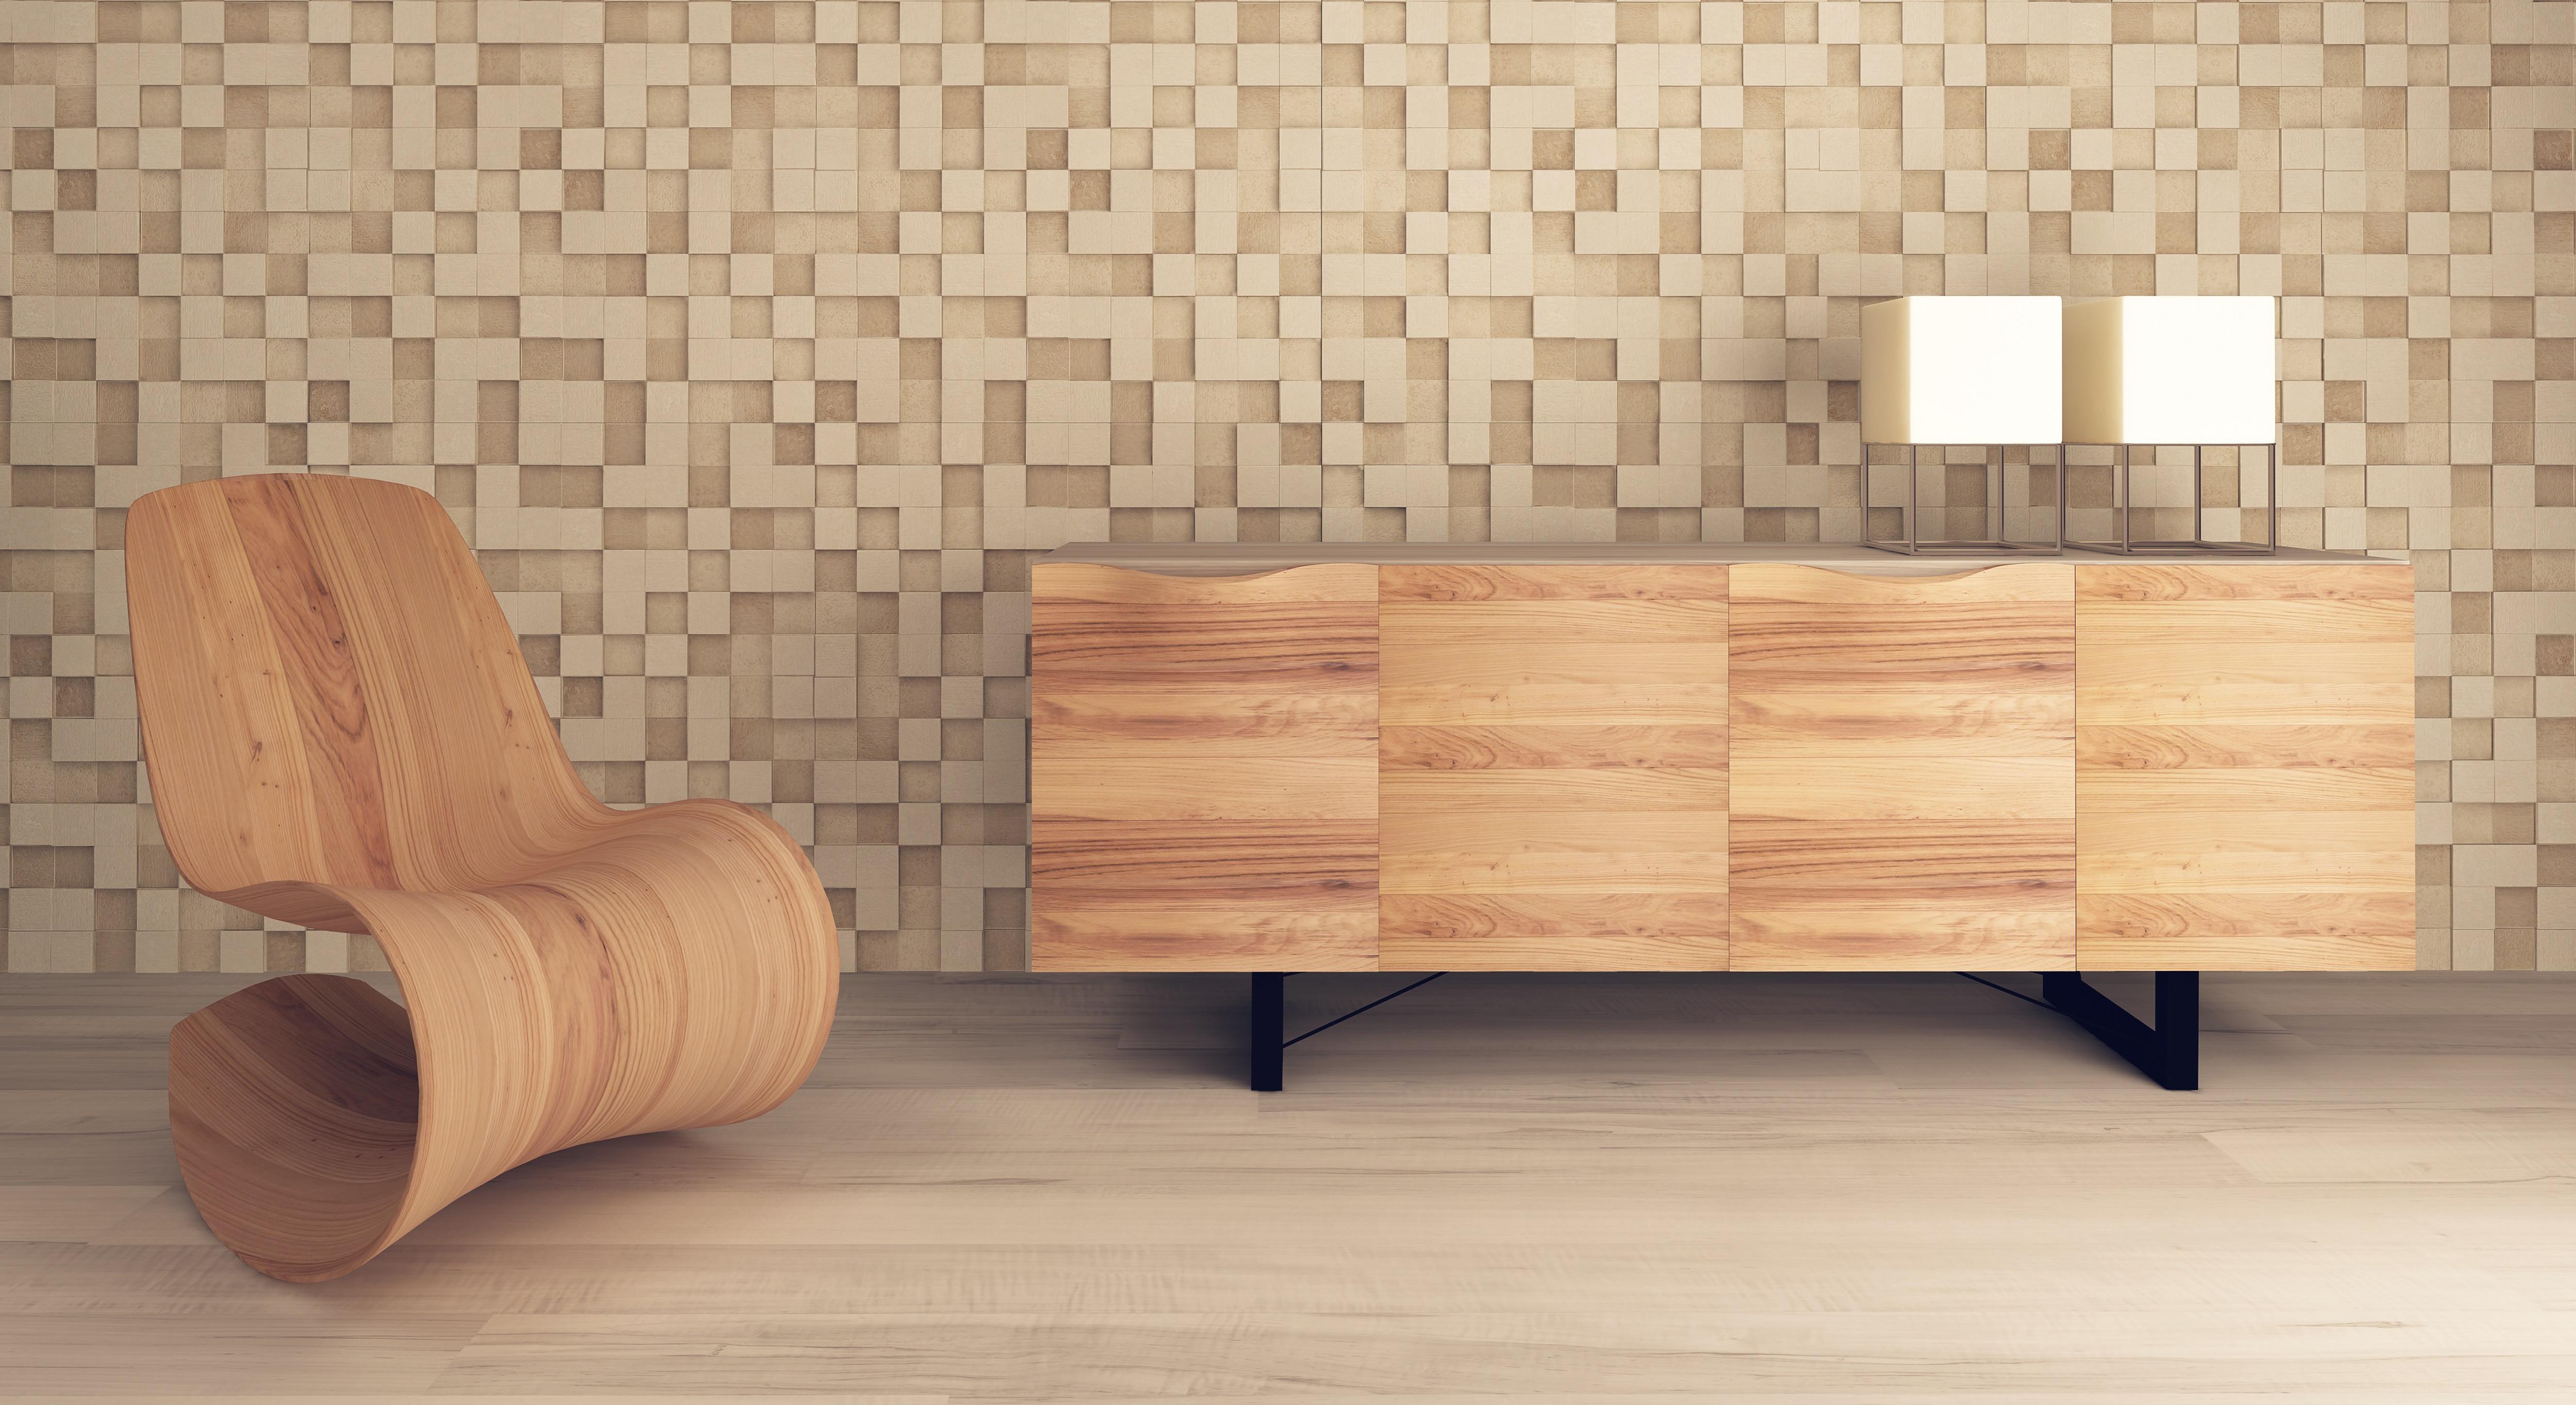 New furniture segmentpic teknos for C furniture new lynn